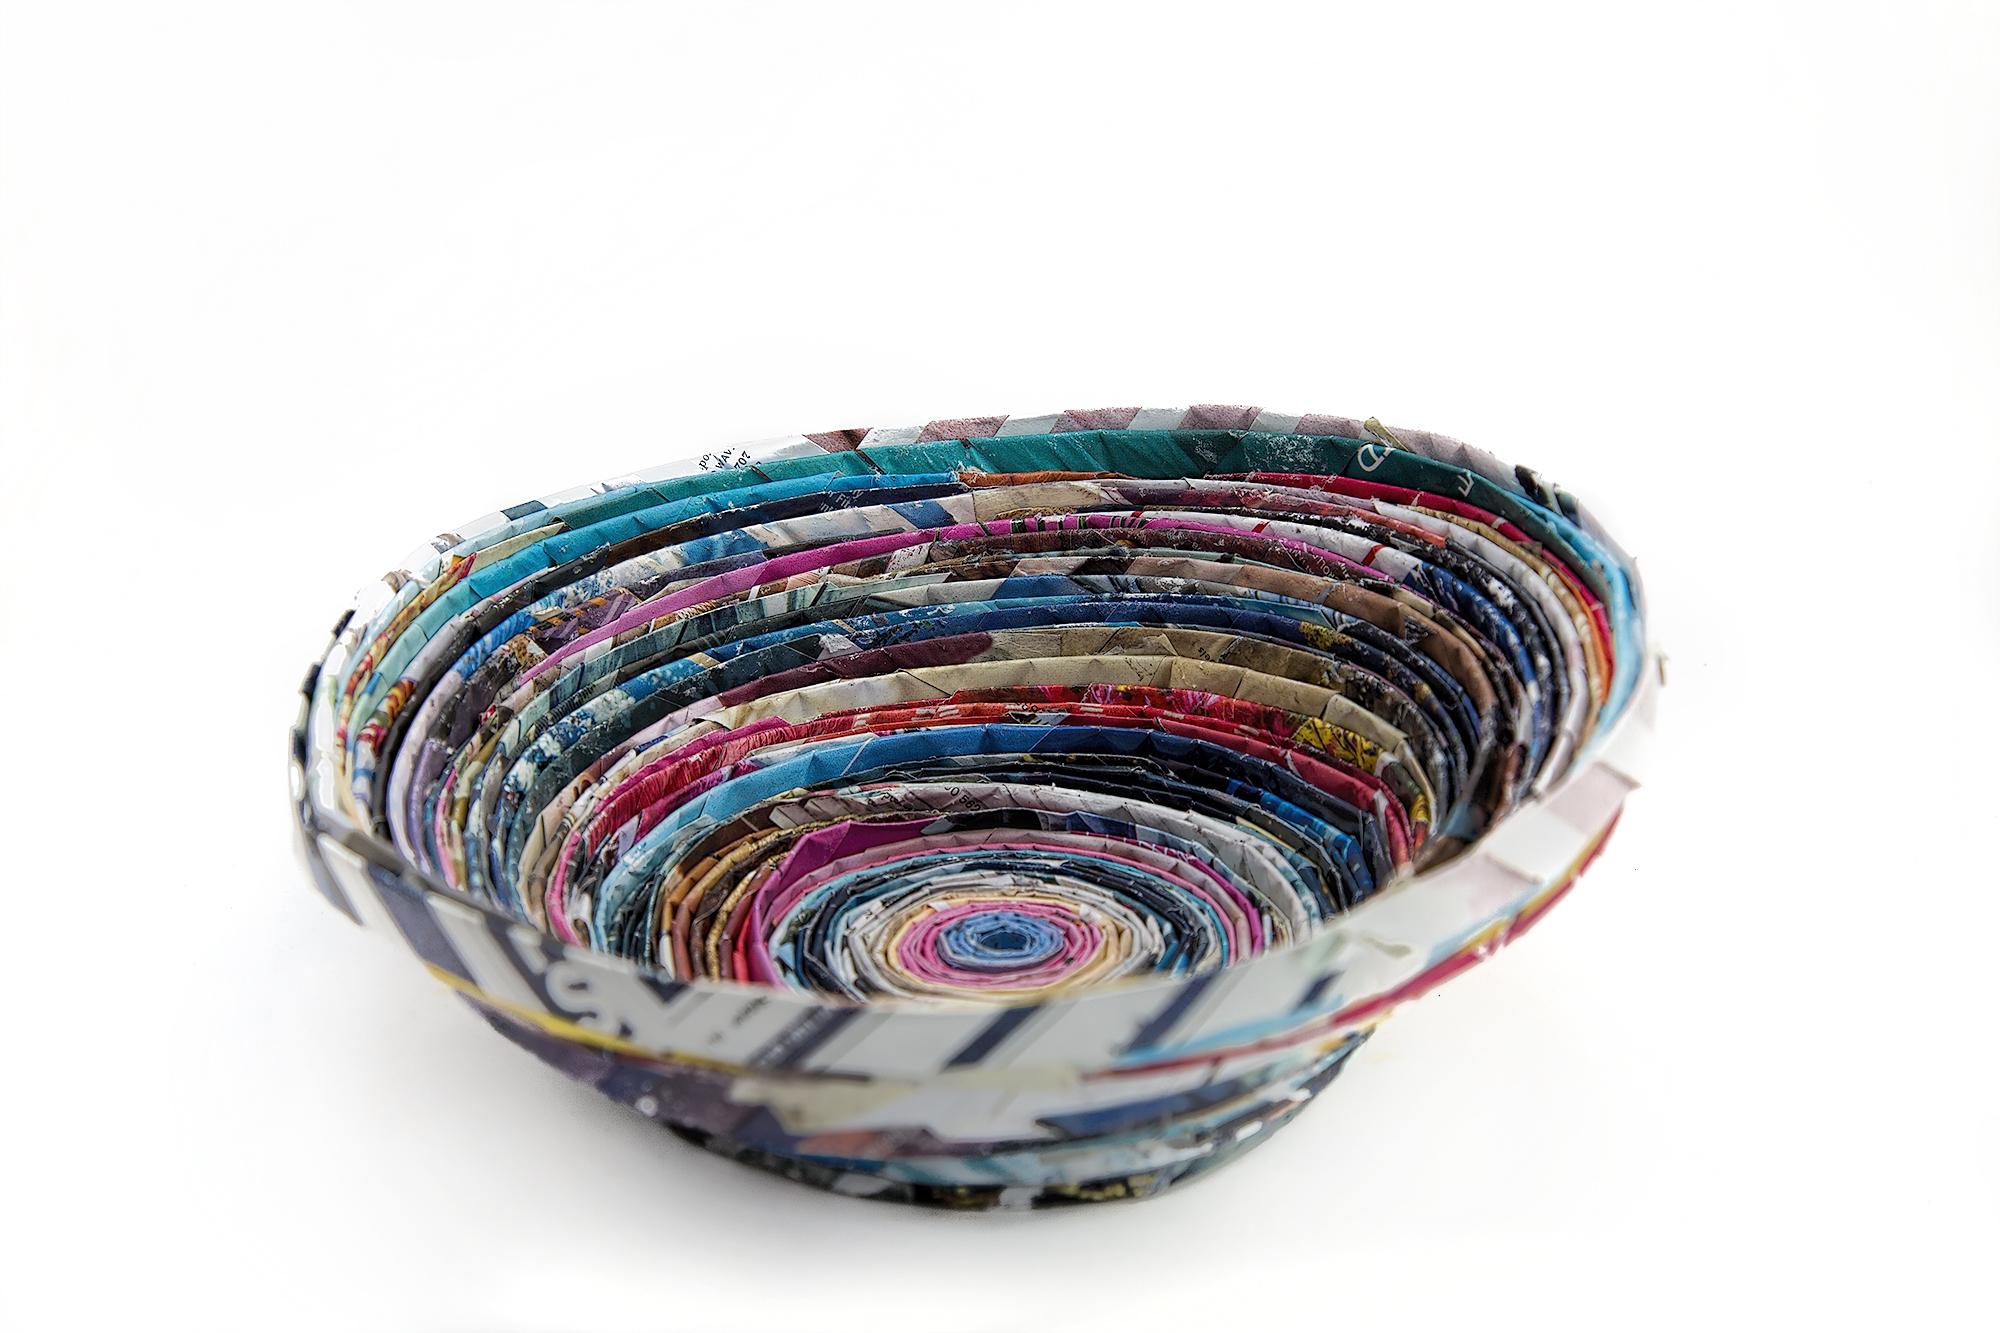 diy recycled magazine bowl